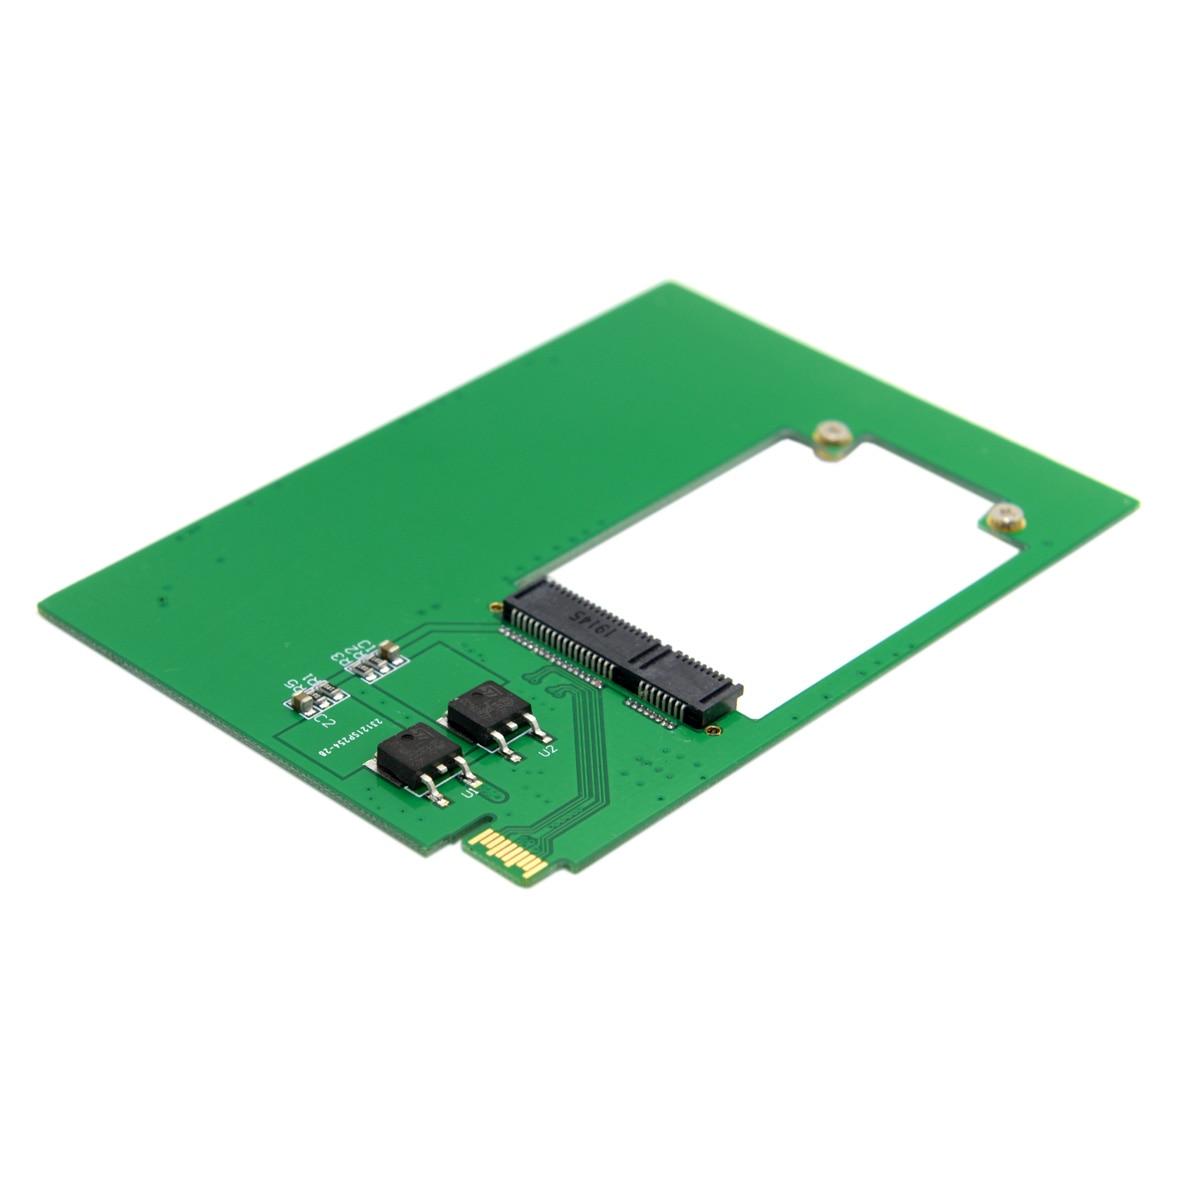 SFF-8784 SATA Express на MSATA Карты PCBA для UltraSlim жесткого диска SSD WD5000M22K WD5000M21K WD5000MPCK